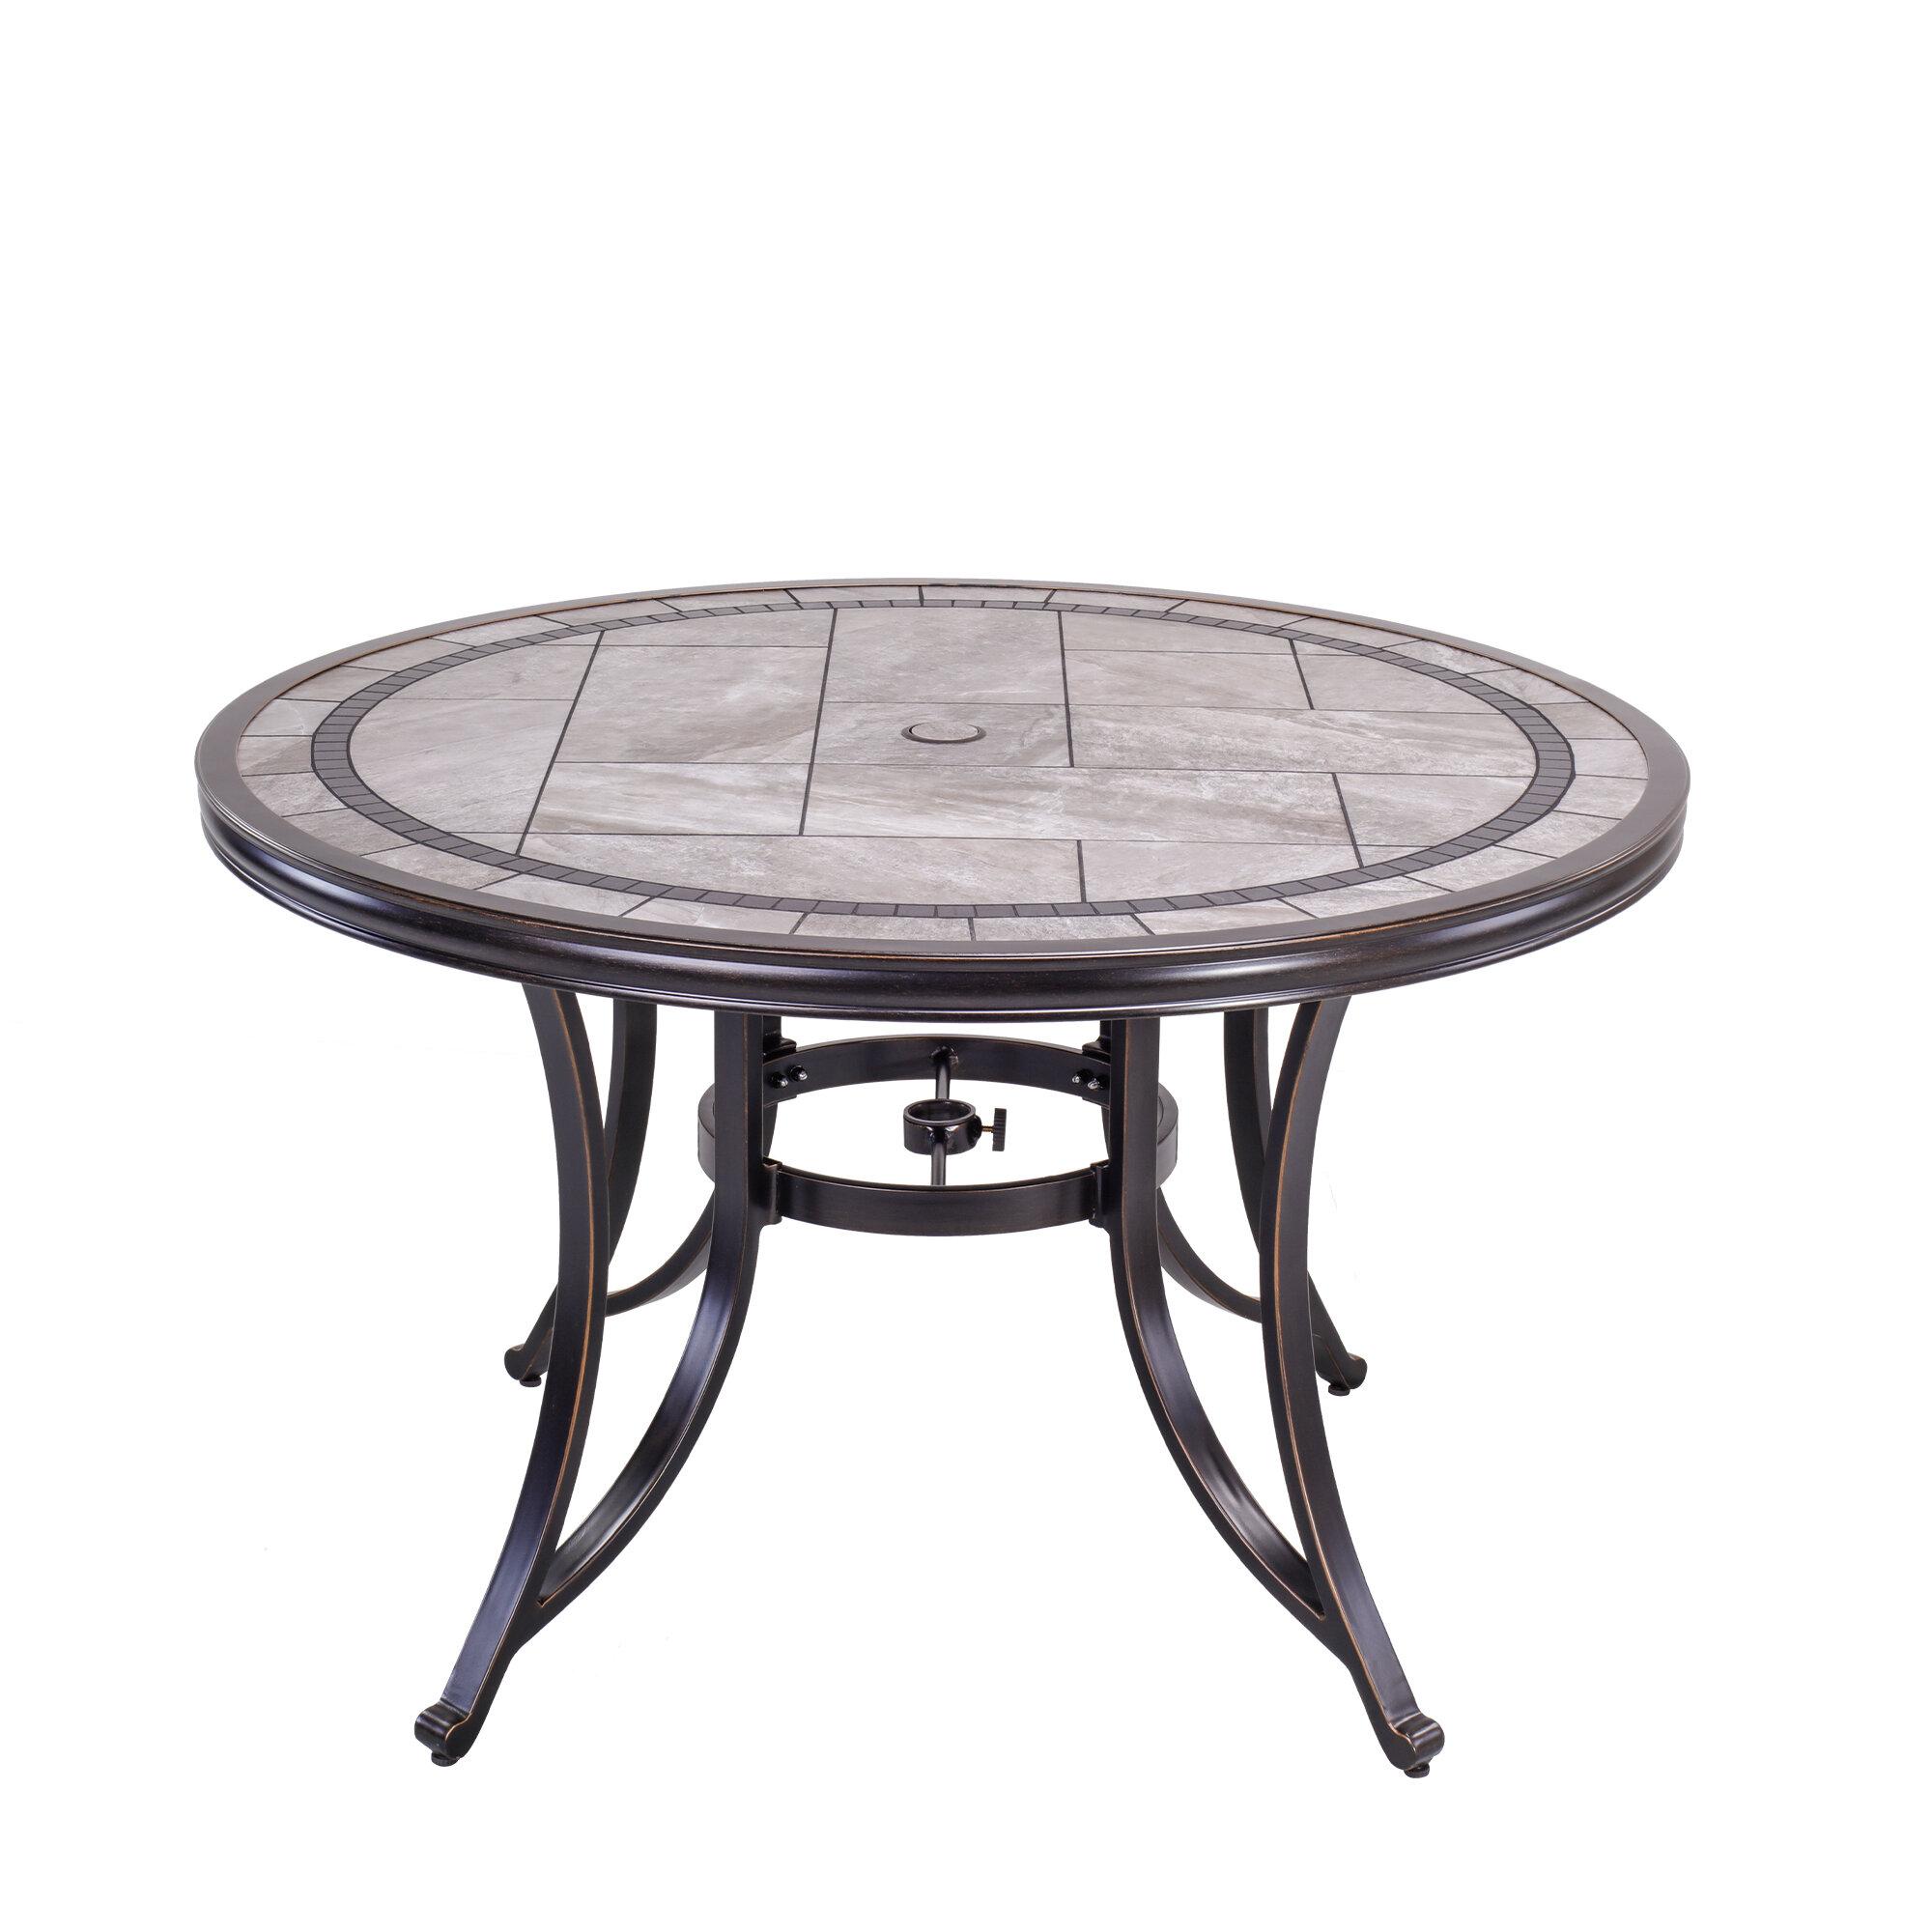 Fleur De Lis Living 46 Round Patio Table With Handmade Porcelain Top And Heavy Duty Frame Reviews Wayfair